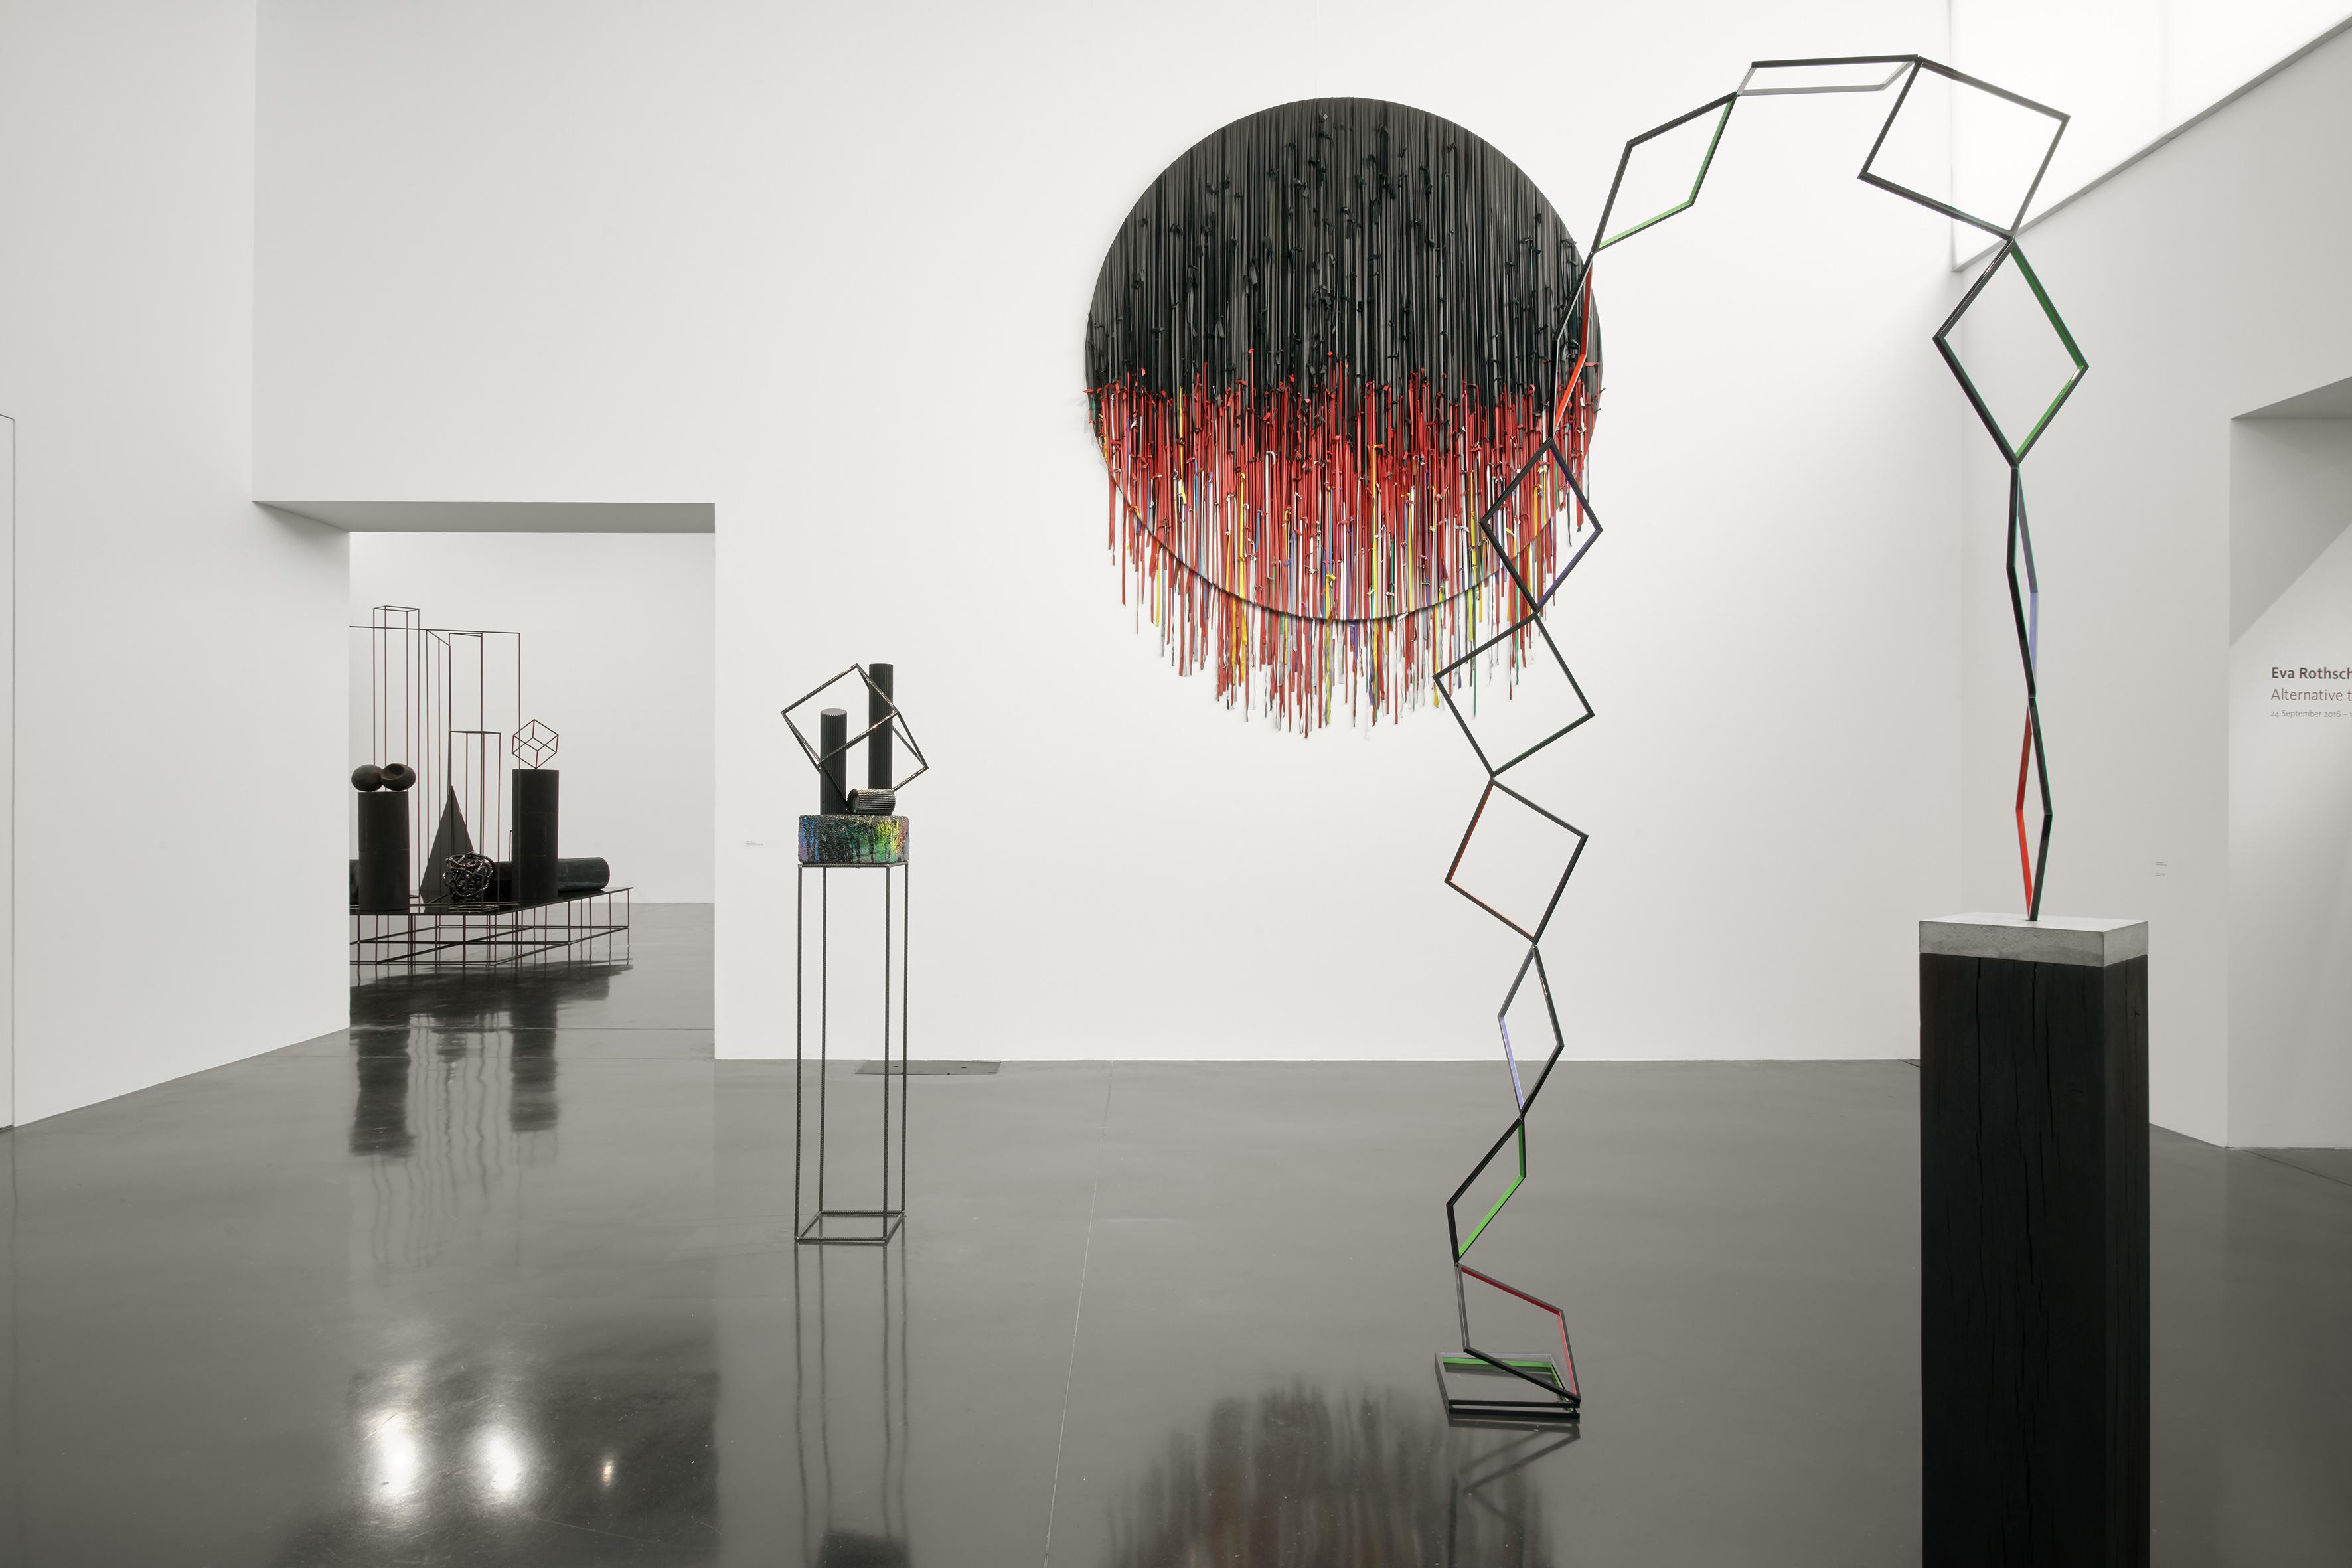 Eva Rothschild Alternative To Power The New Art Gallery